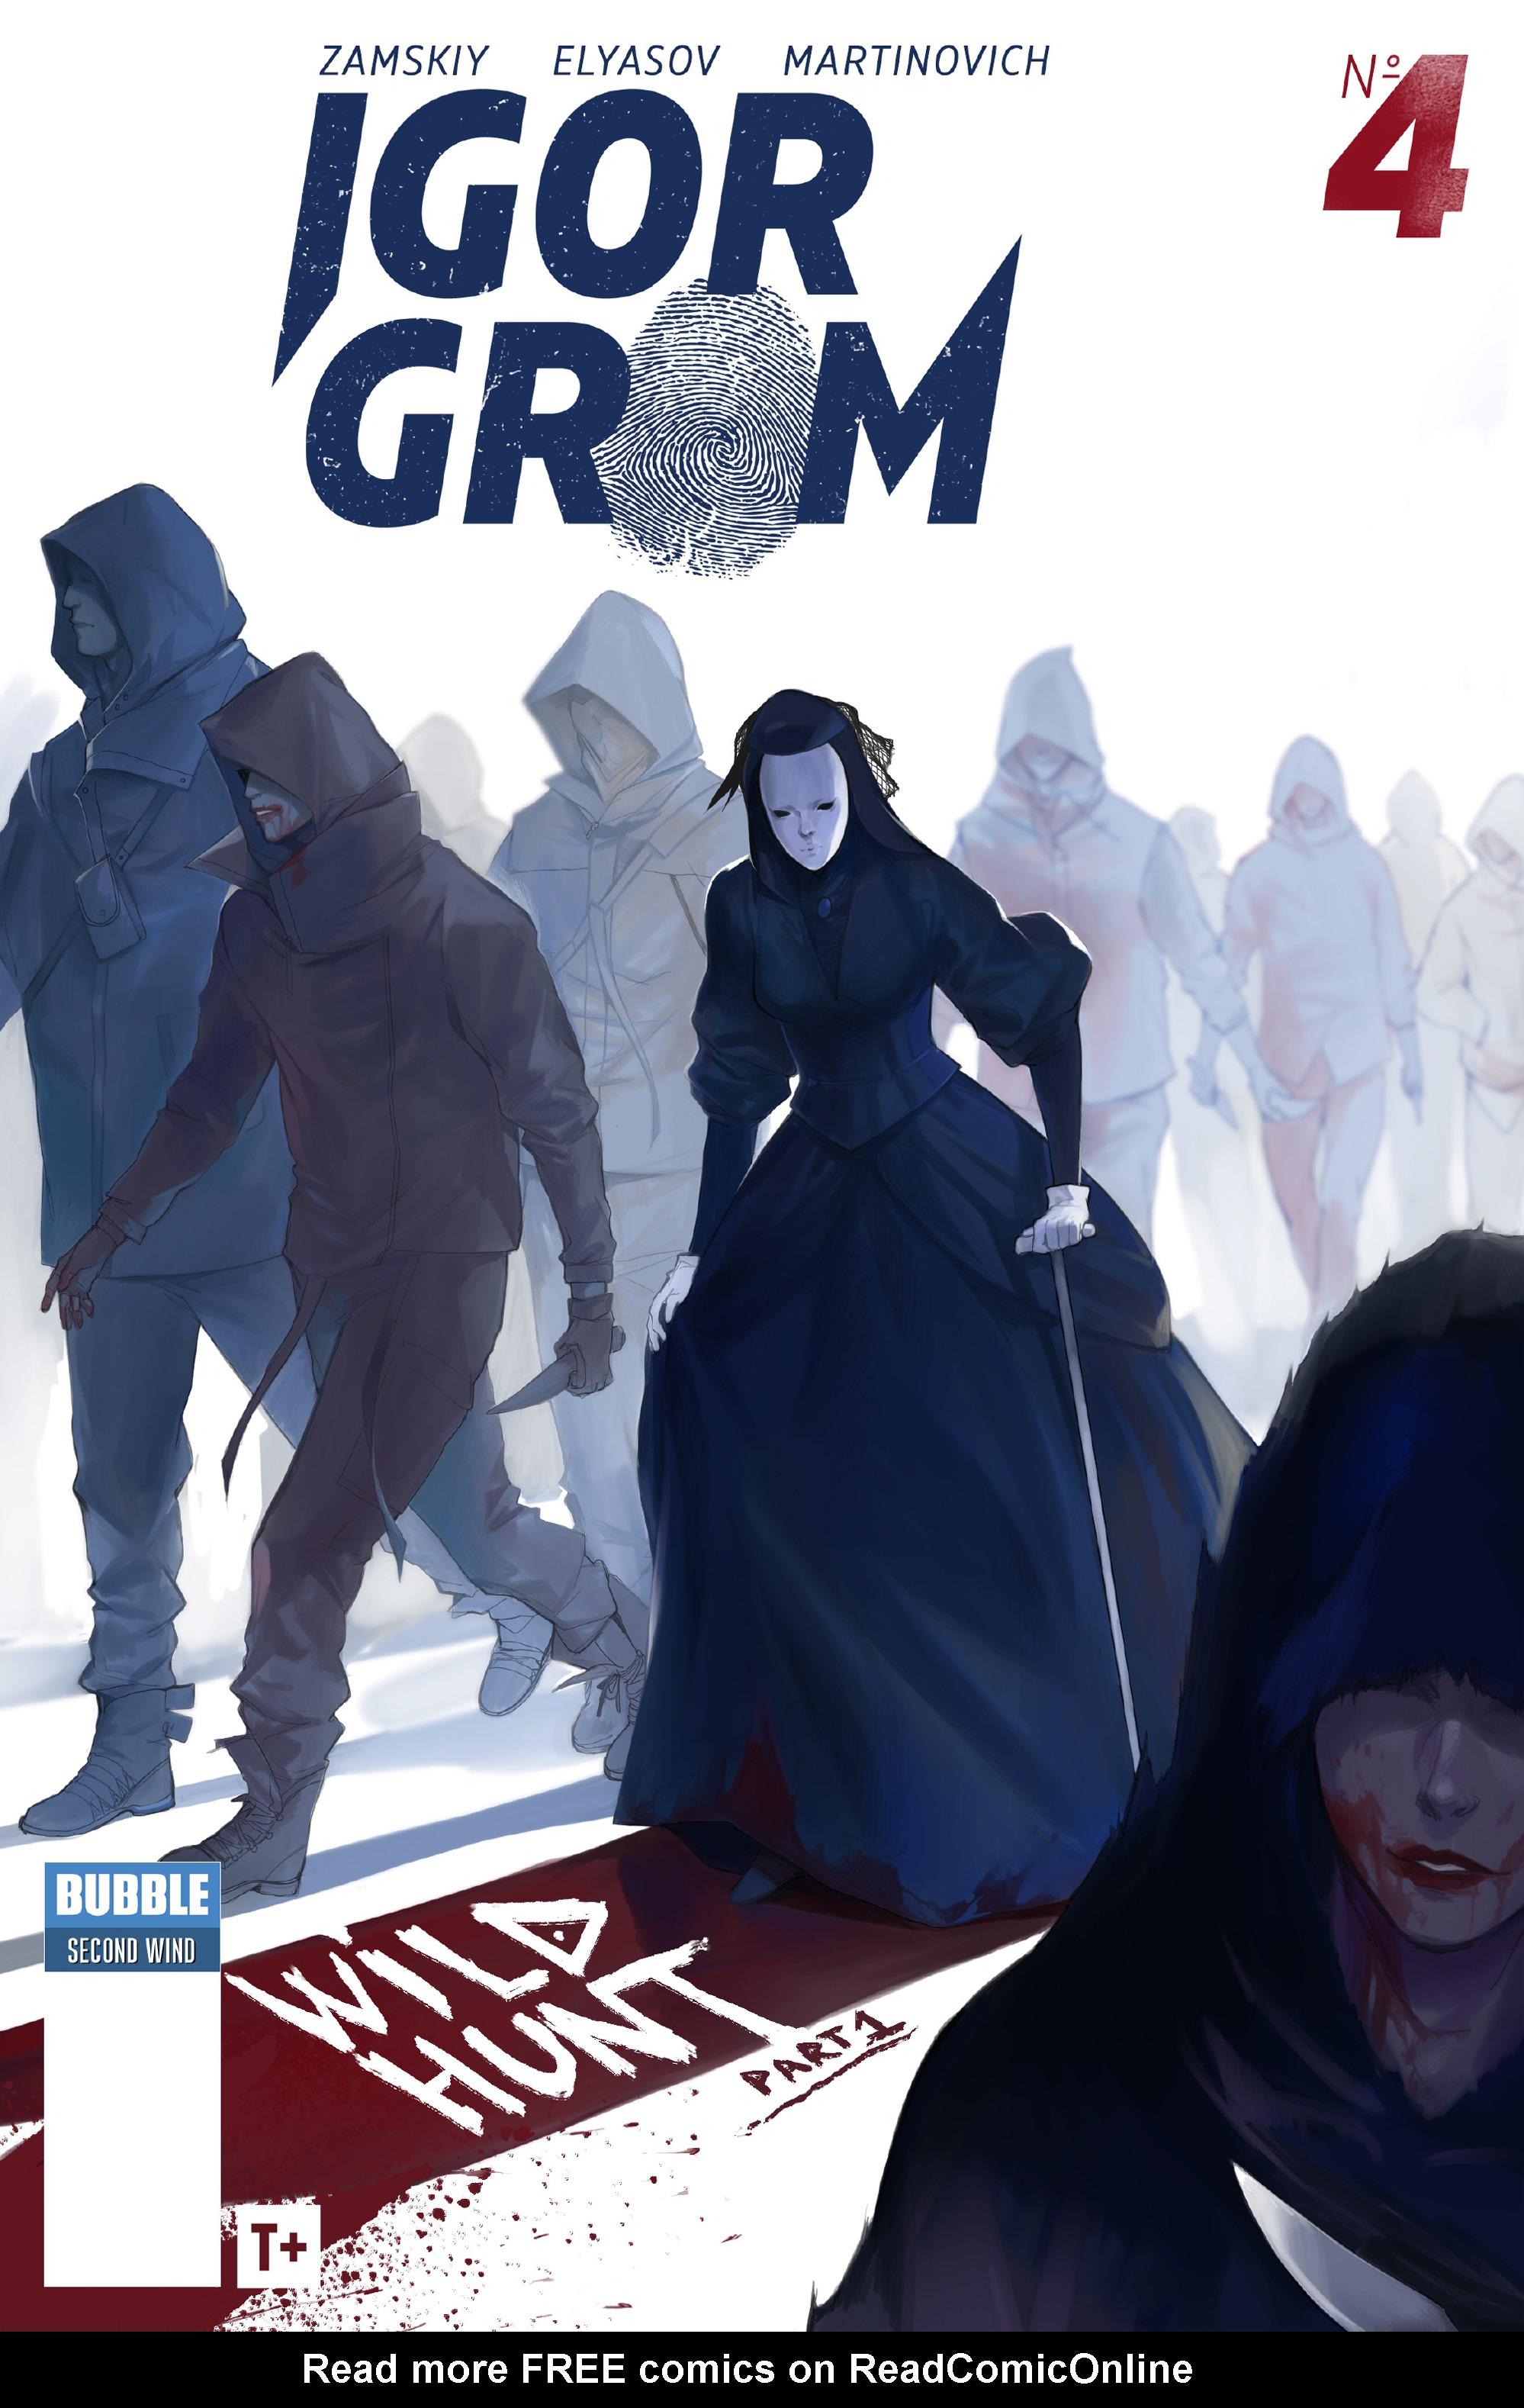 Read online Igor Grom comic -  Issue #4 - 1